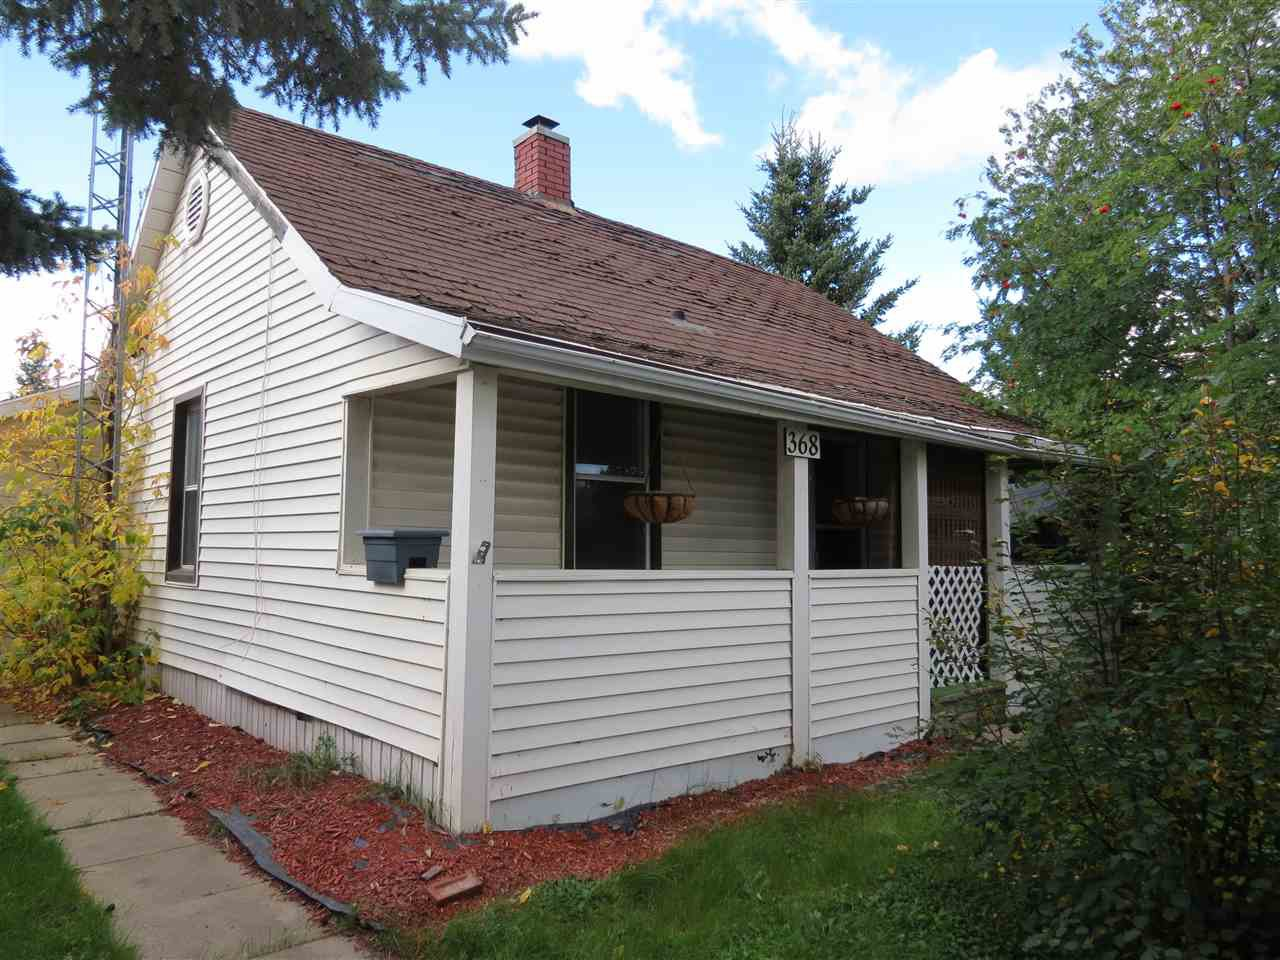 Main Photo: 368 West Railway Drive: Smoky Lake Town House for sale : MLS®# E4174701